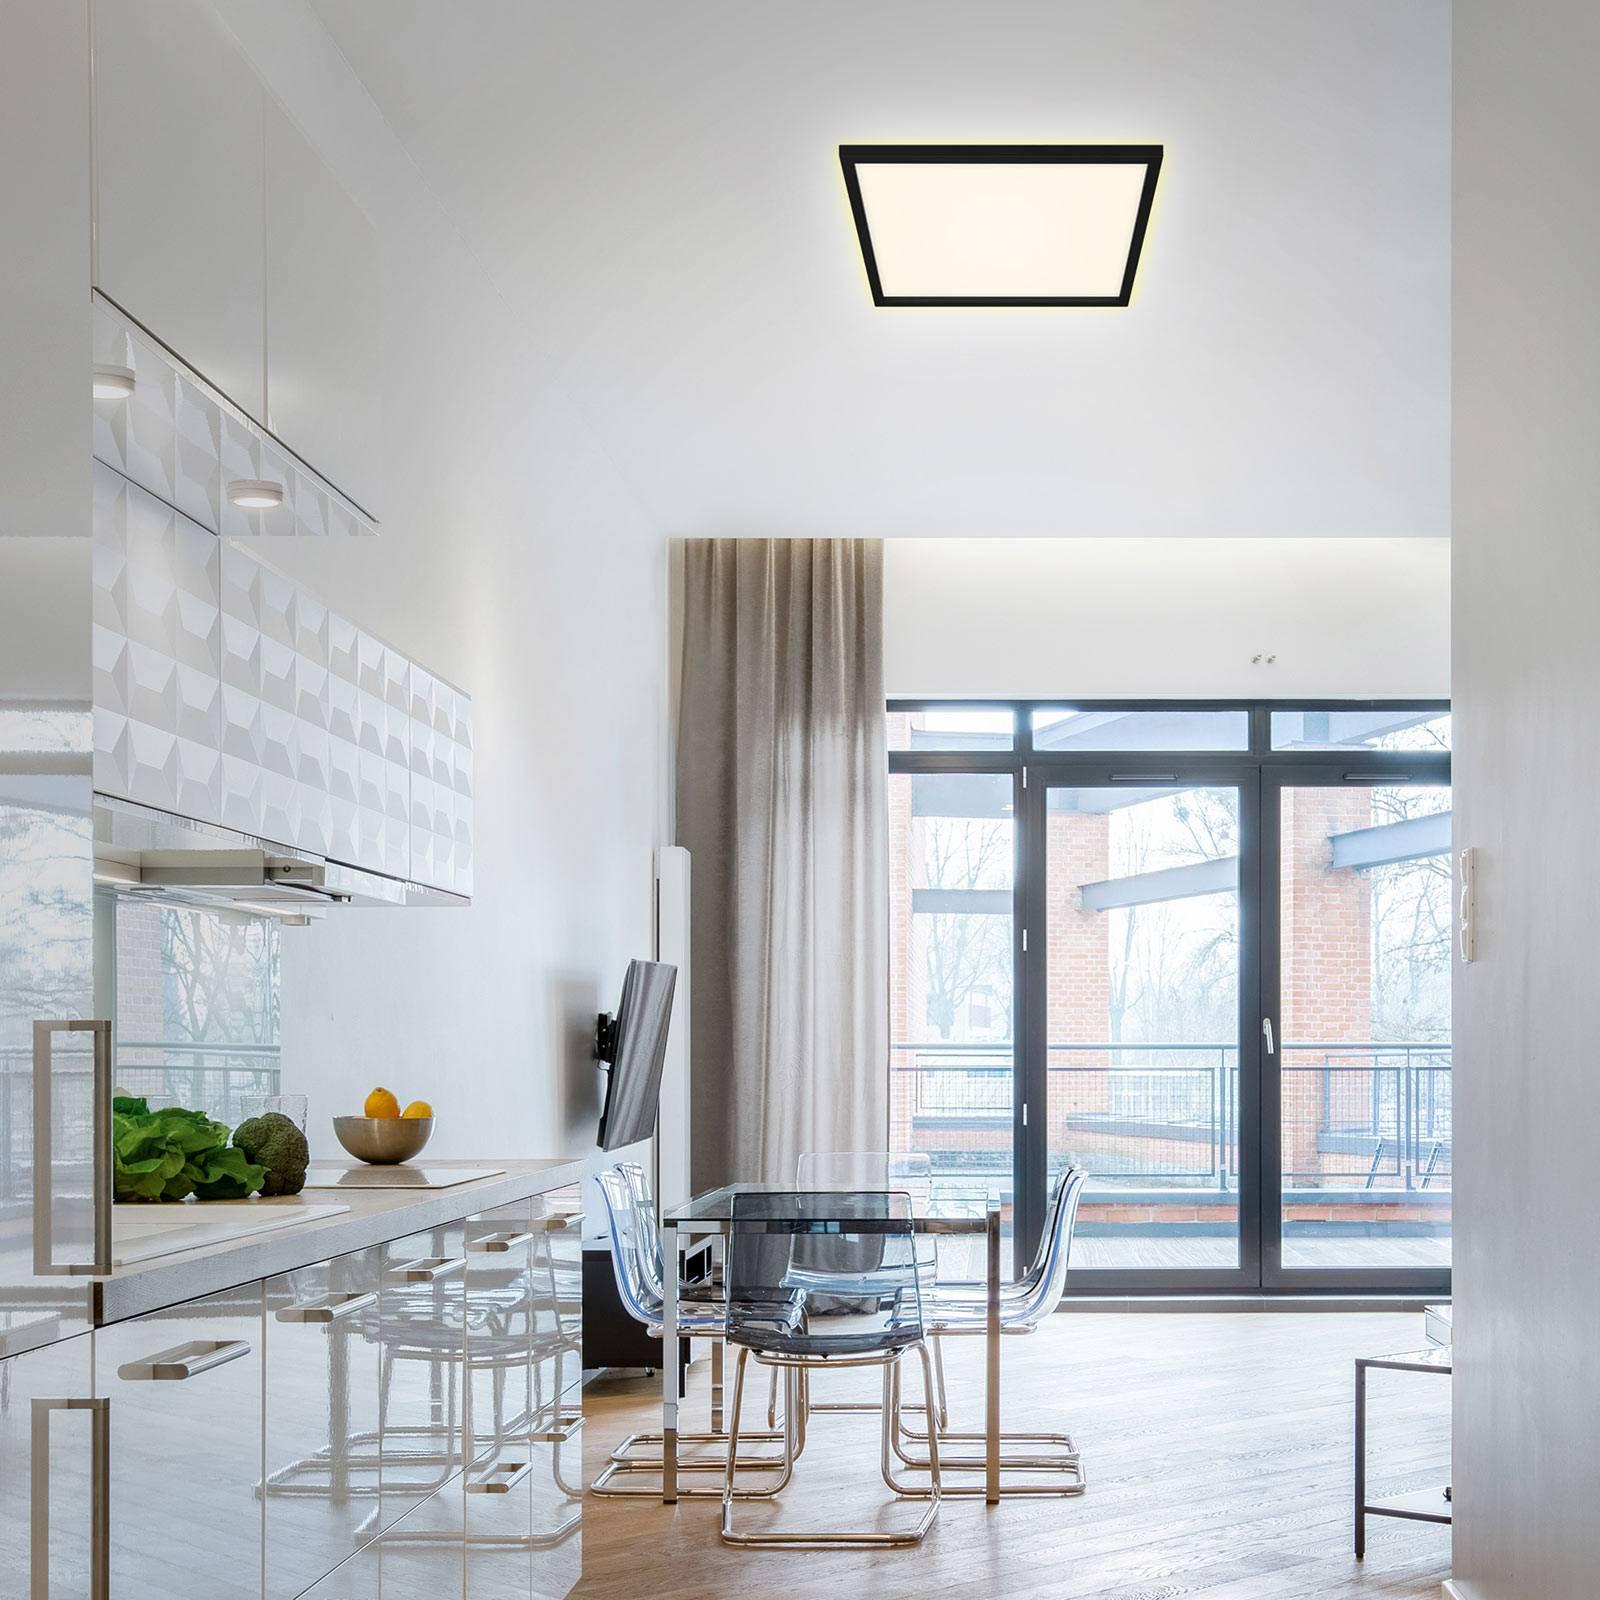 LED plafondlamp 7364, 42 x 42 cm, zwart